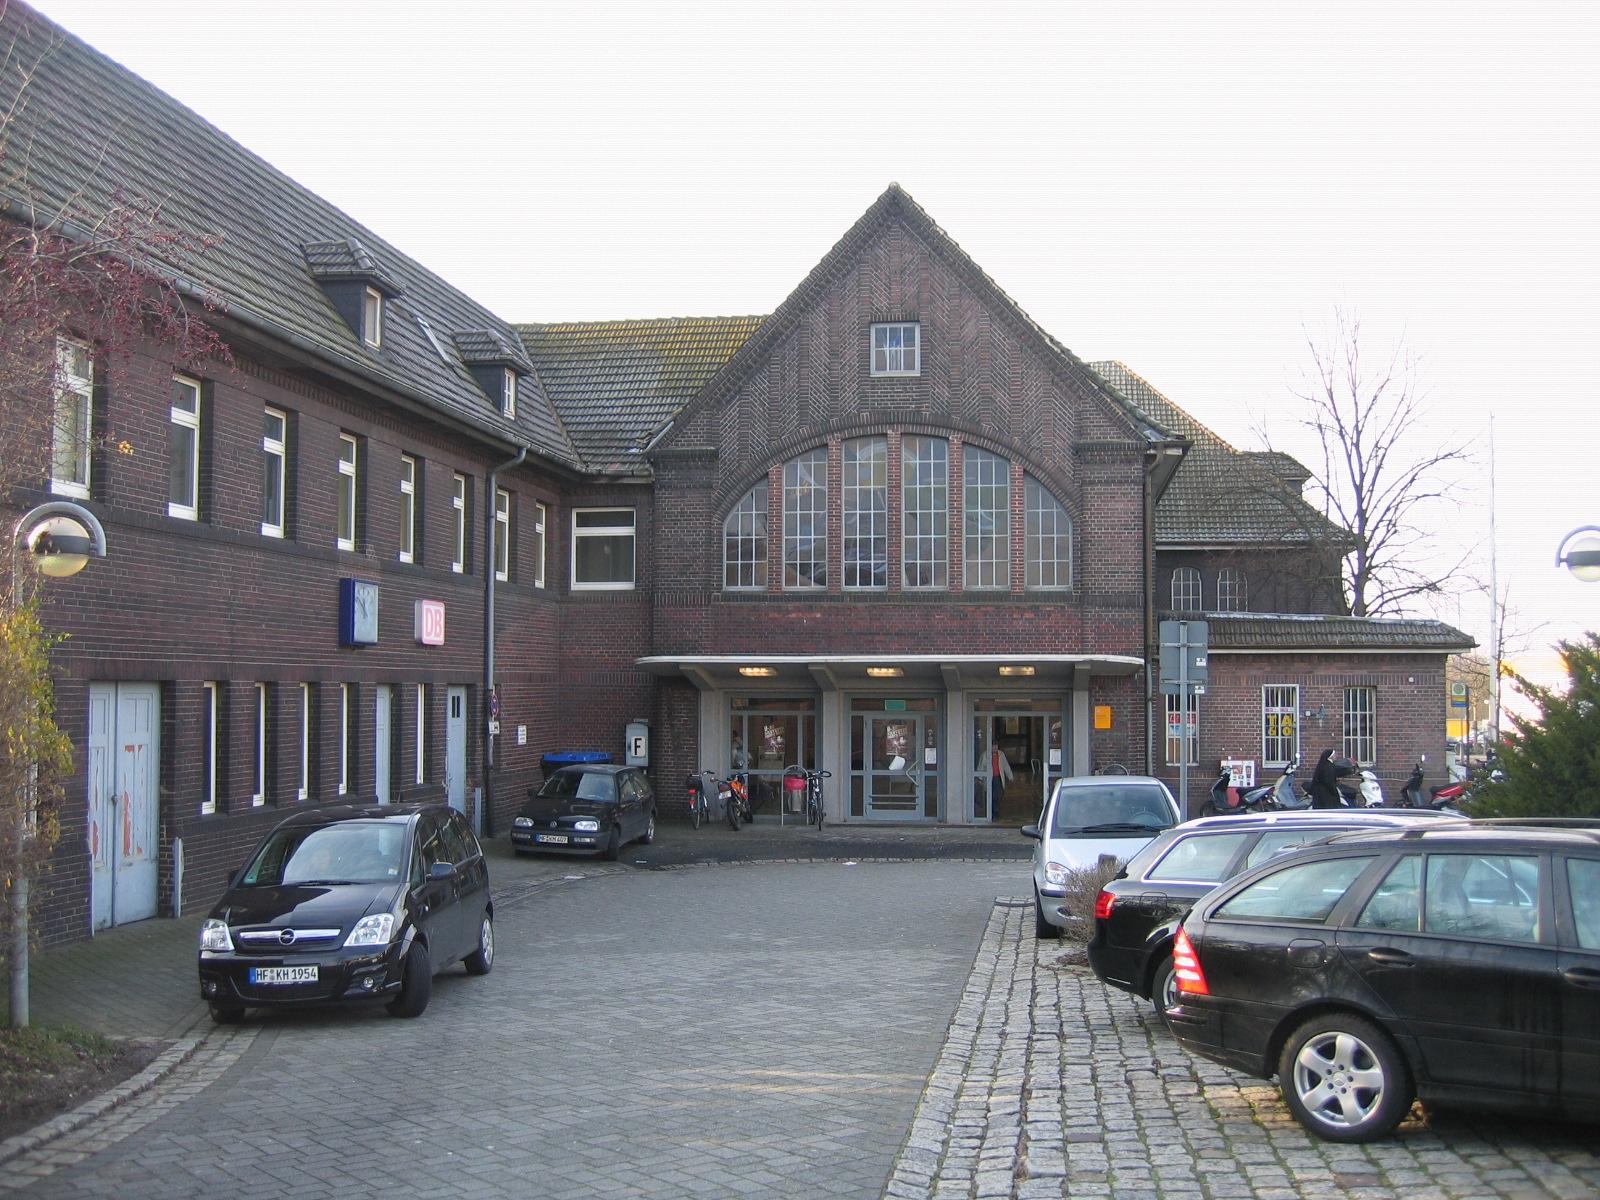 Bahnhof Löhne file löhne bahnhof 2009 12 16 jpg wikimedia commons